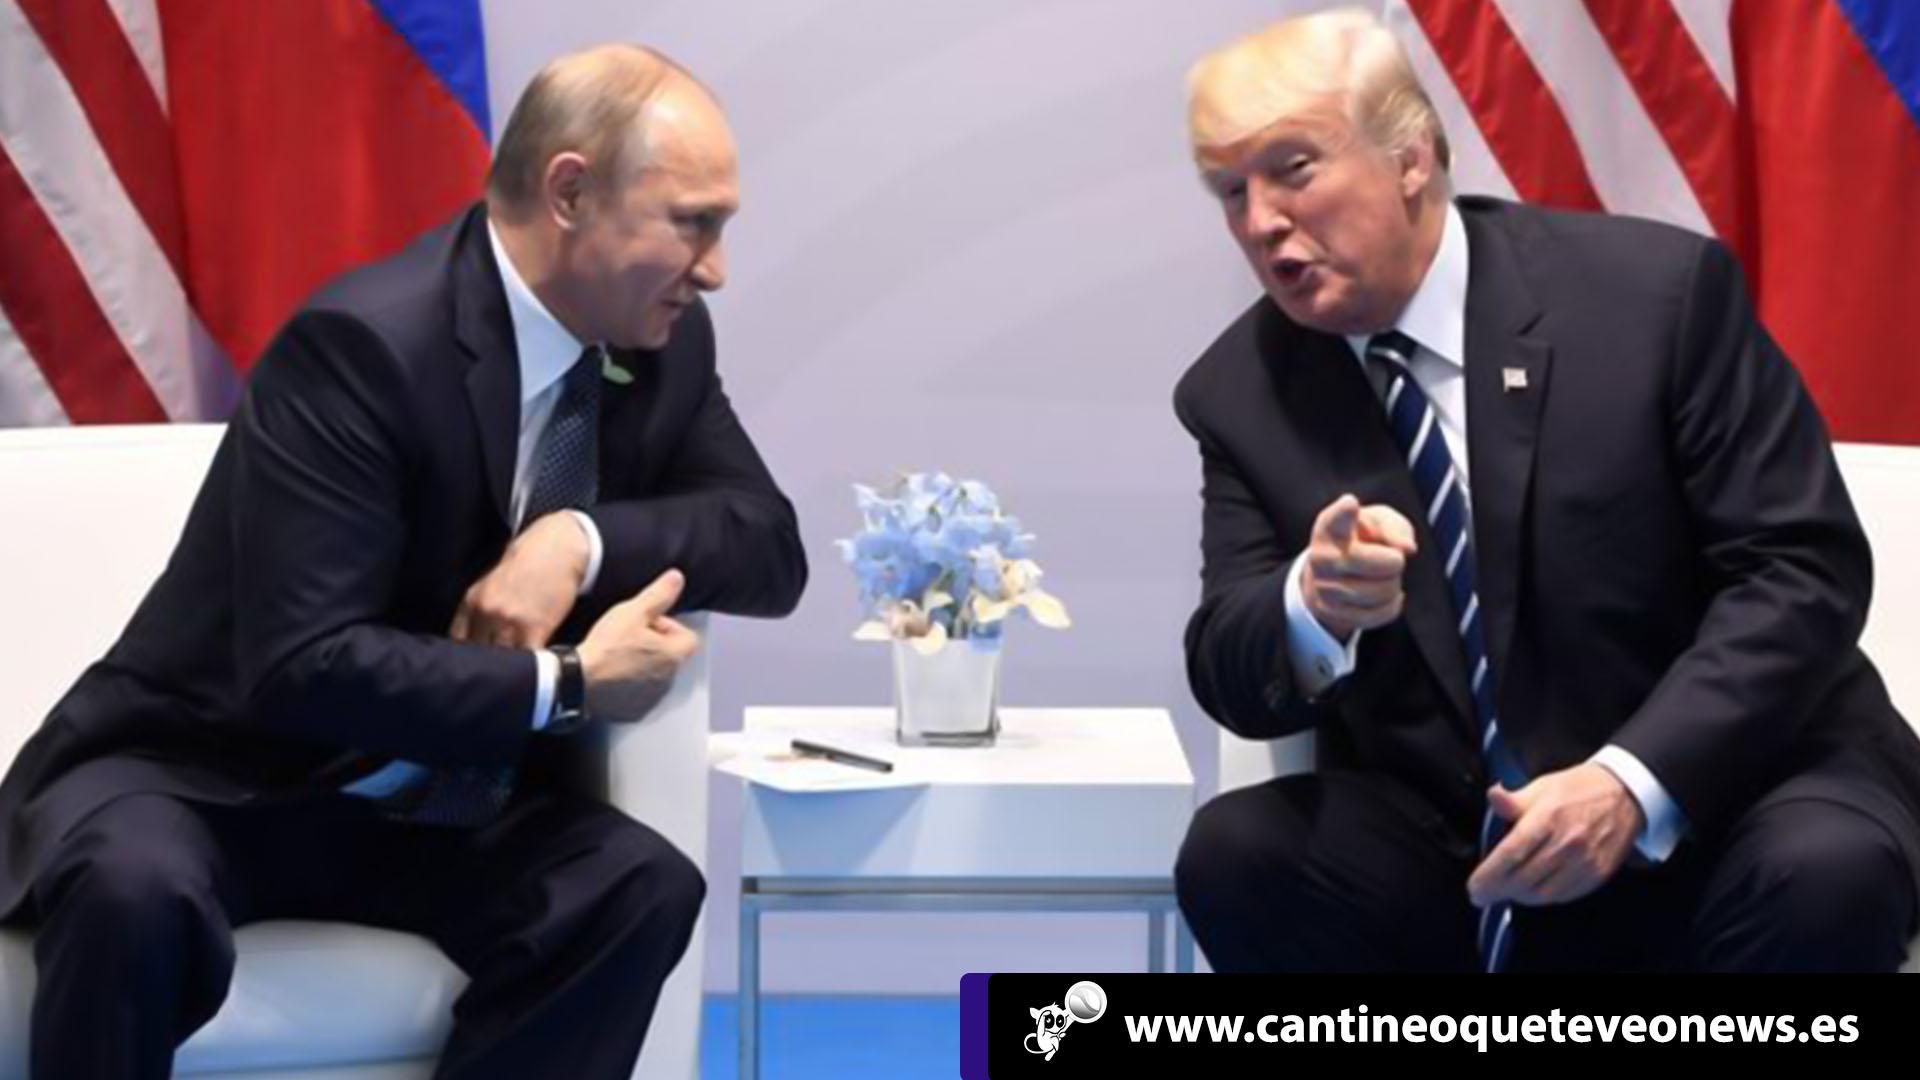 EEUU condena a Rusia